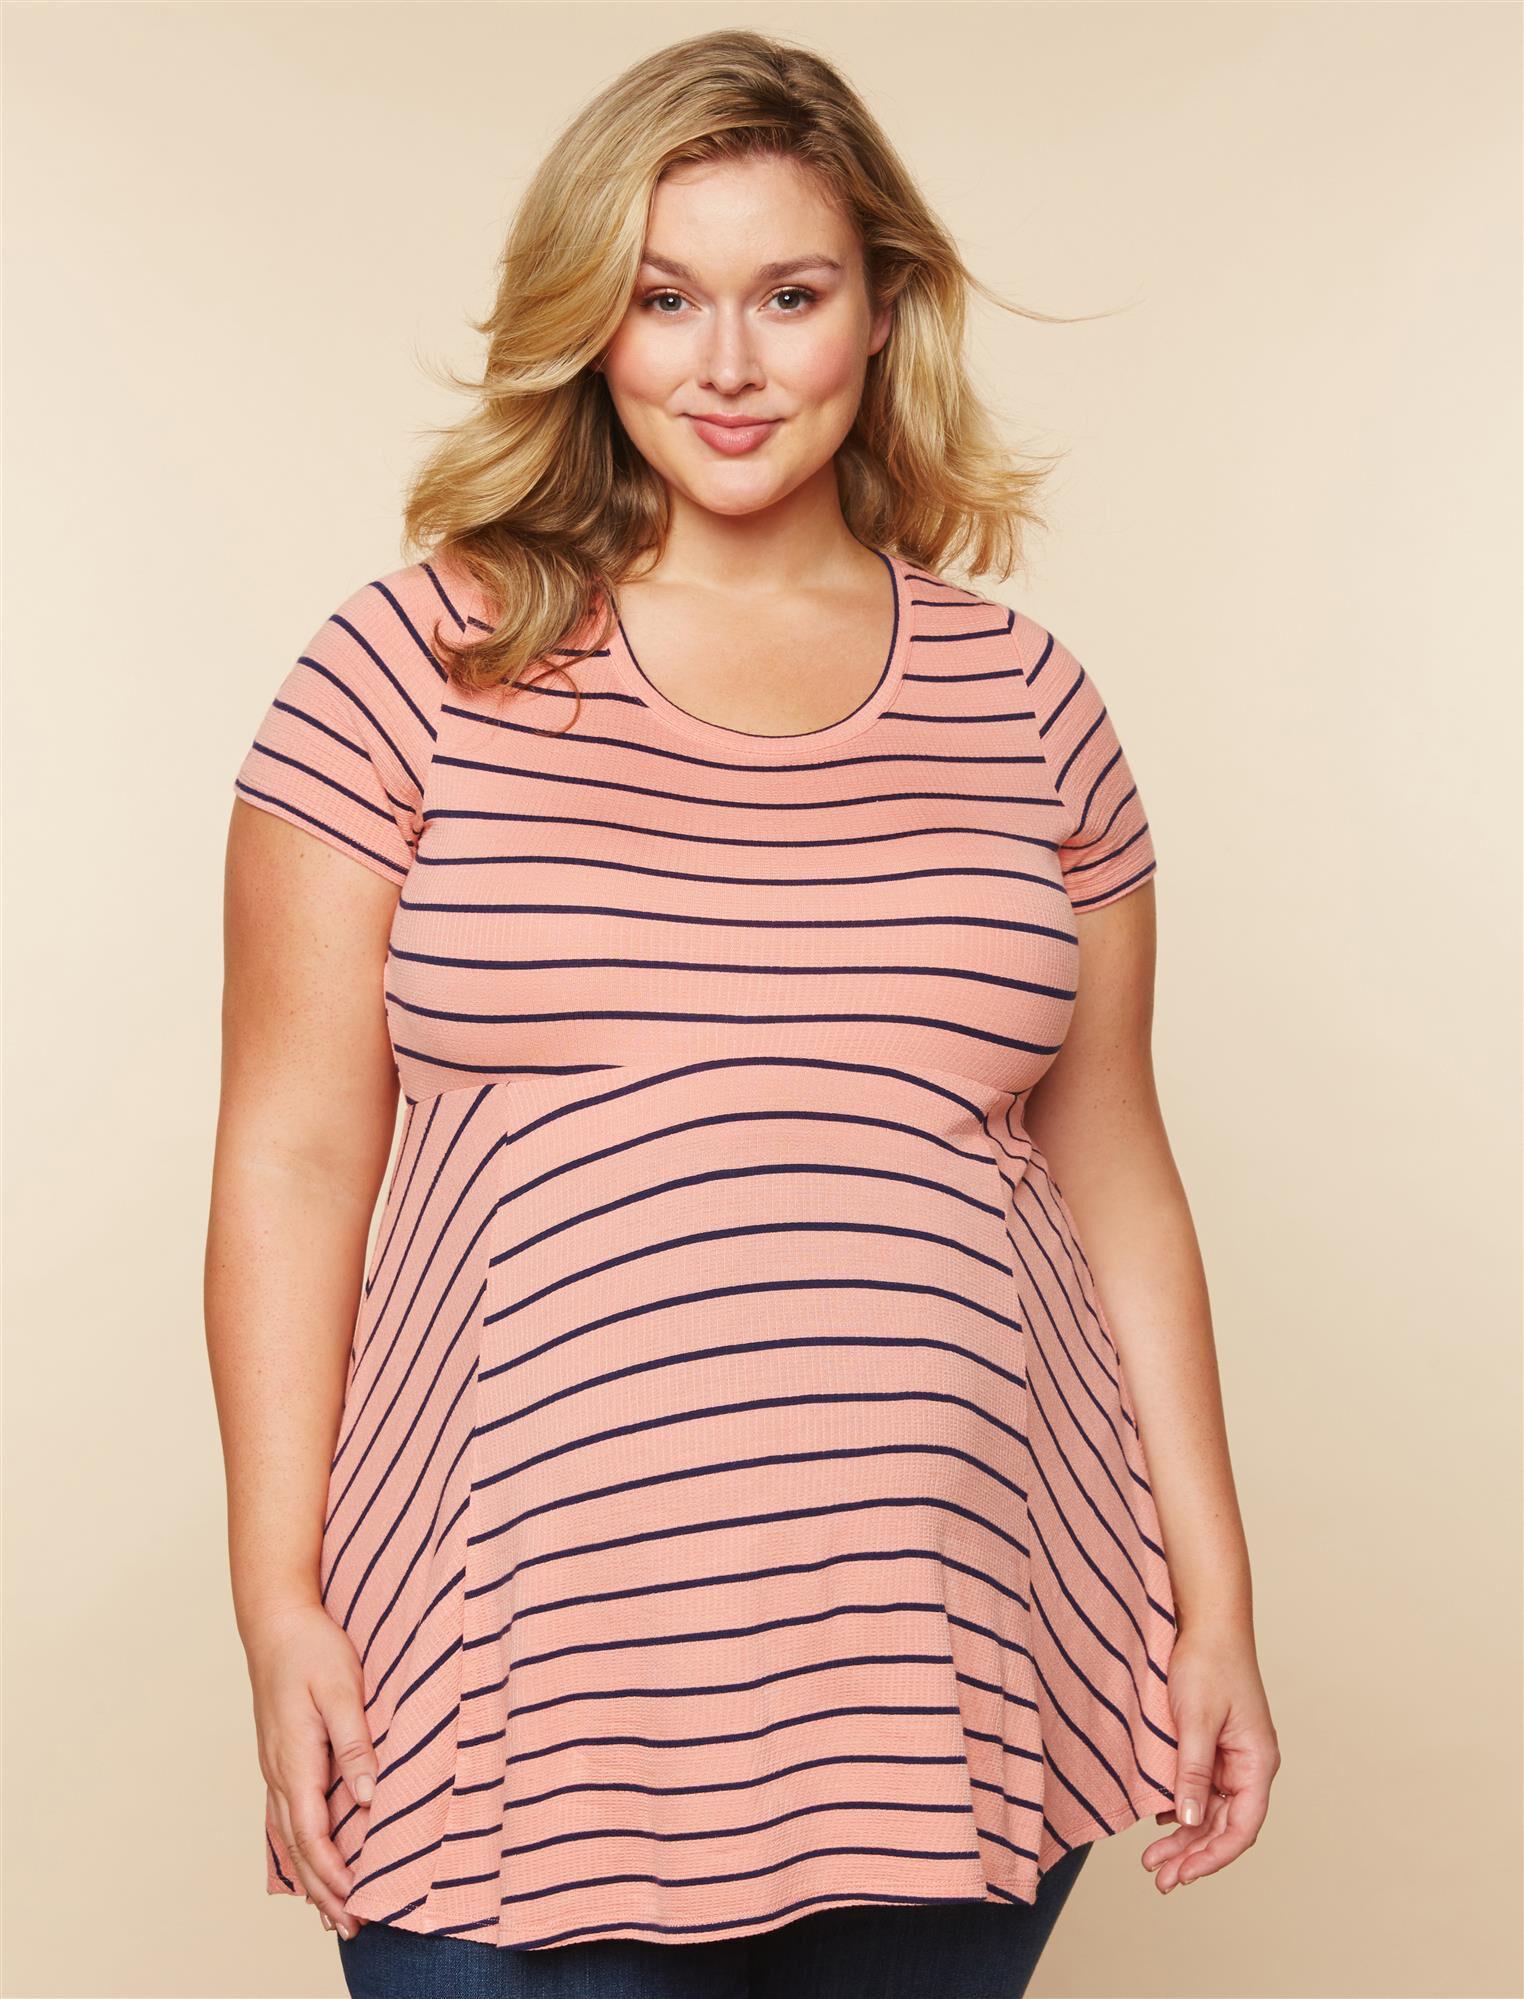 Plus Size Peplum Maternity Top